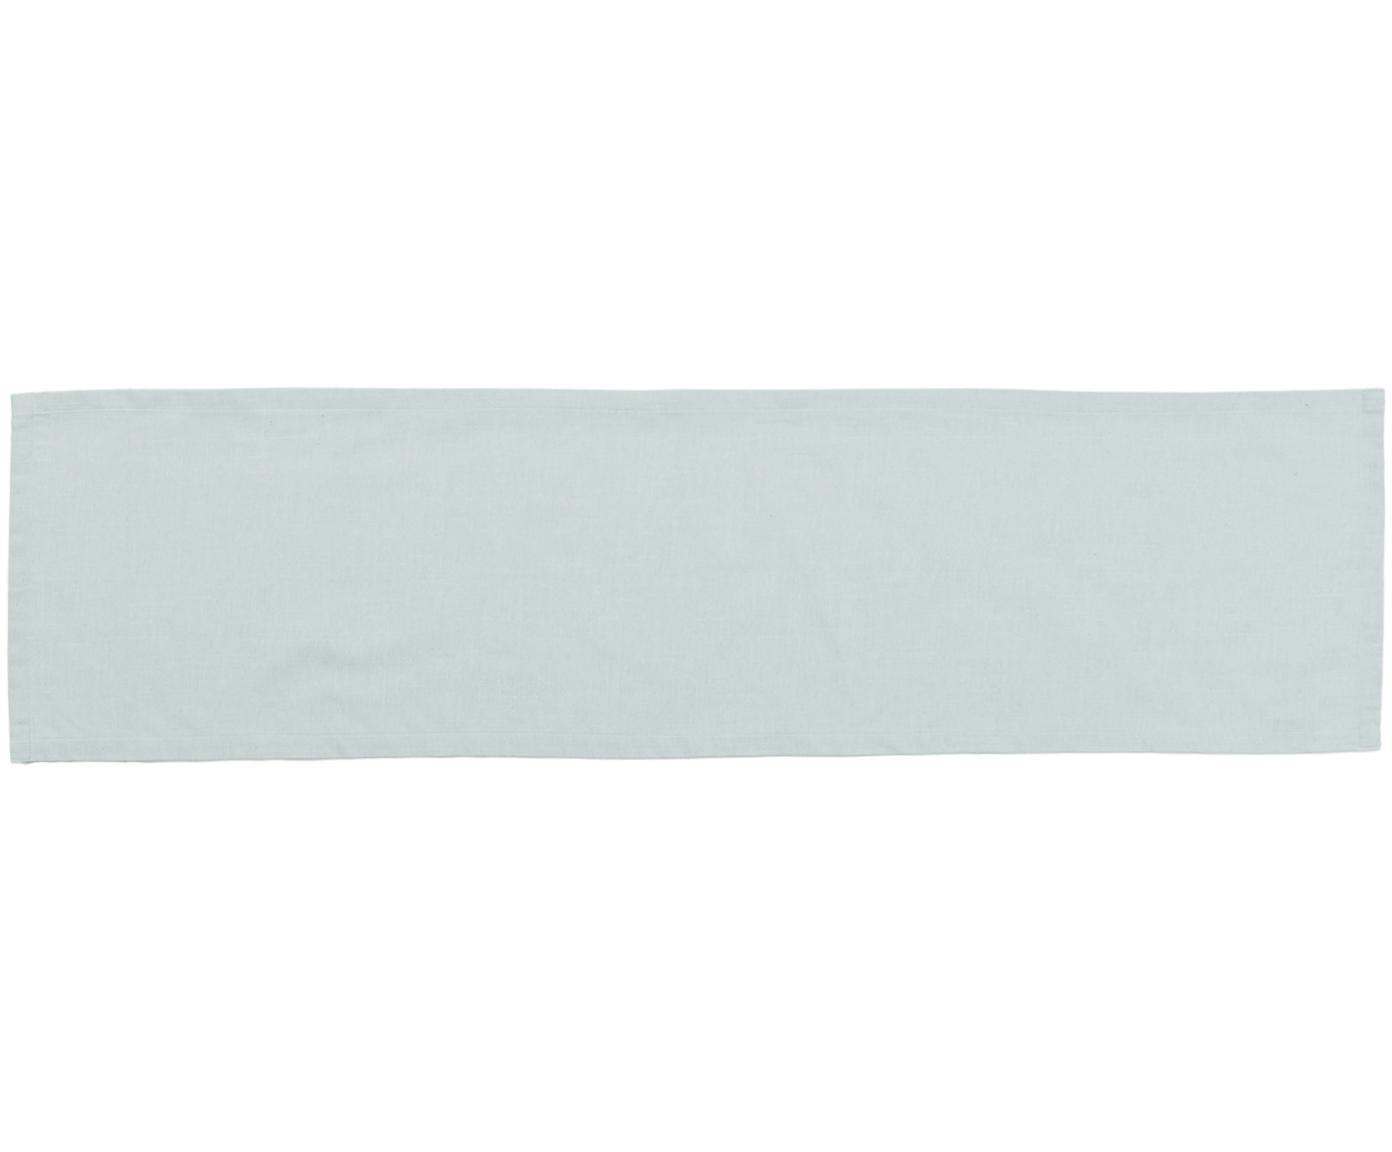 Runner da tavolo Riva, Verde menta, Larg. 40 x Lung. 150 cm